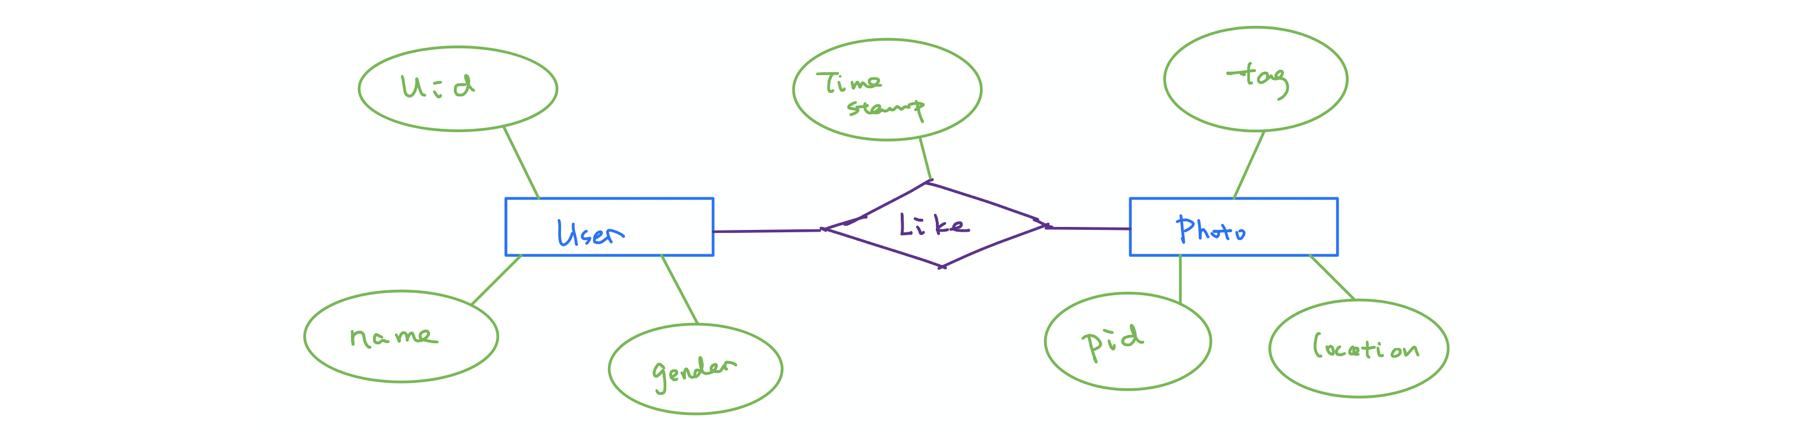 Relational Database 1 | Installation Of Postgres And Pgadmin